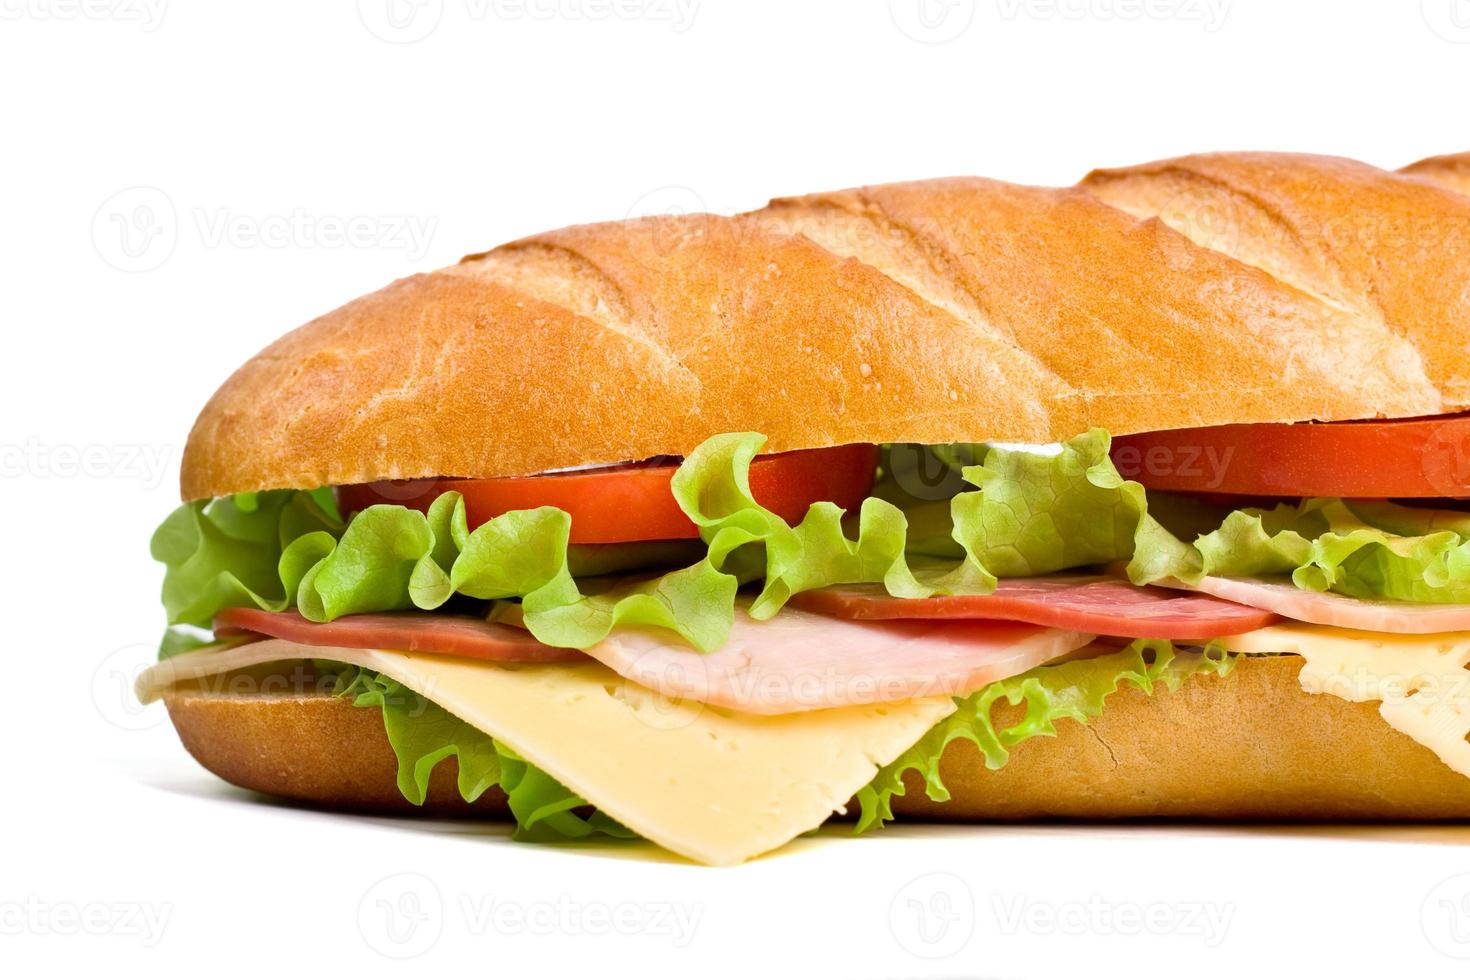 Käse-Schinken-Salat und Tomaten-Baguette foto